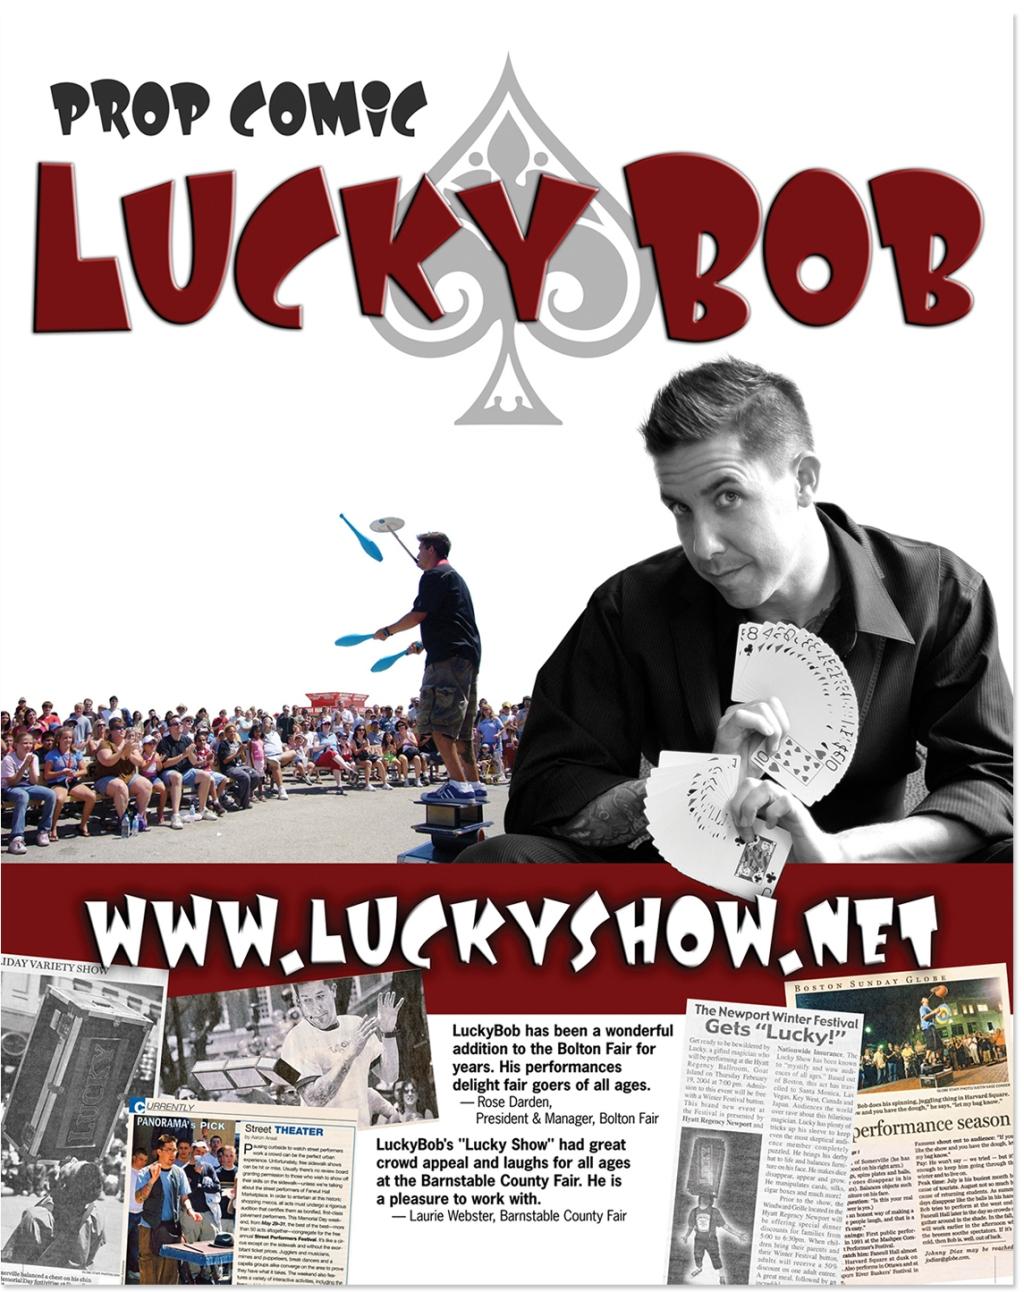 luckybob01